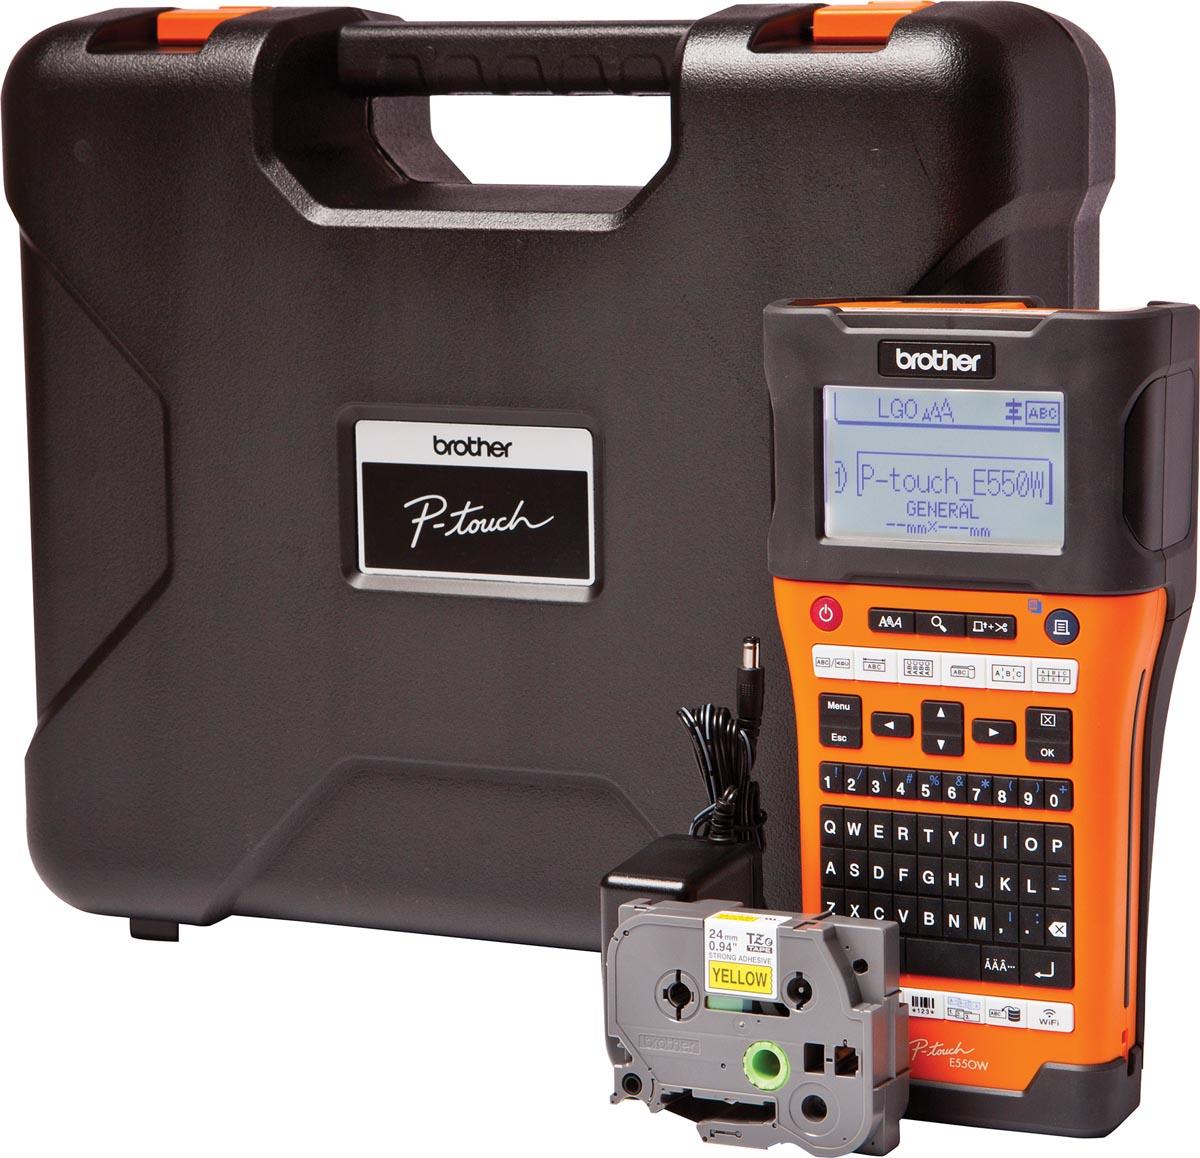 Brother beletteringssysteem PT-E550 met draagkoffer, 2 tapes, adapter en batterij-2